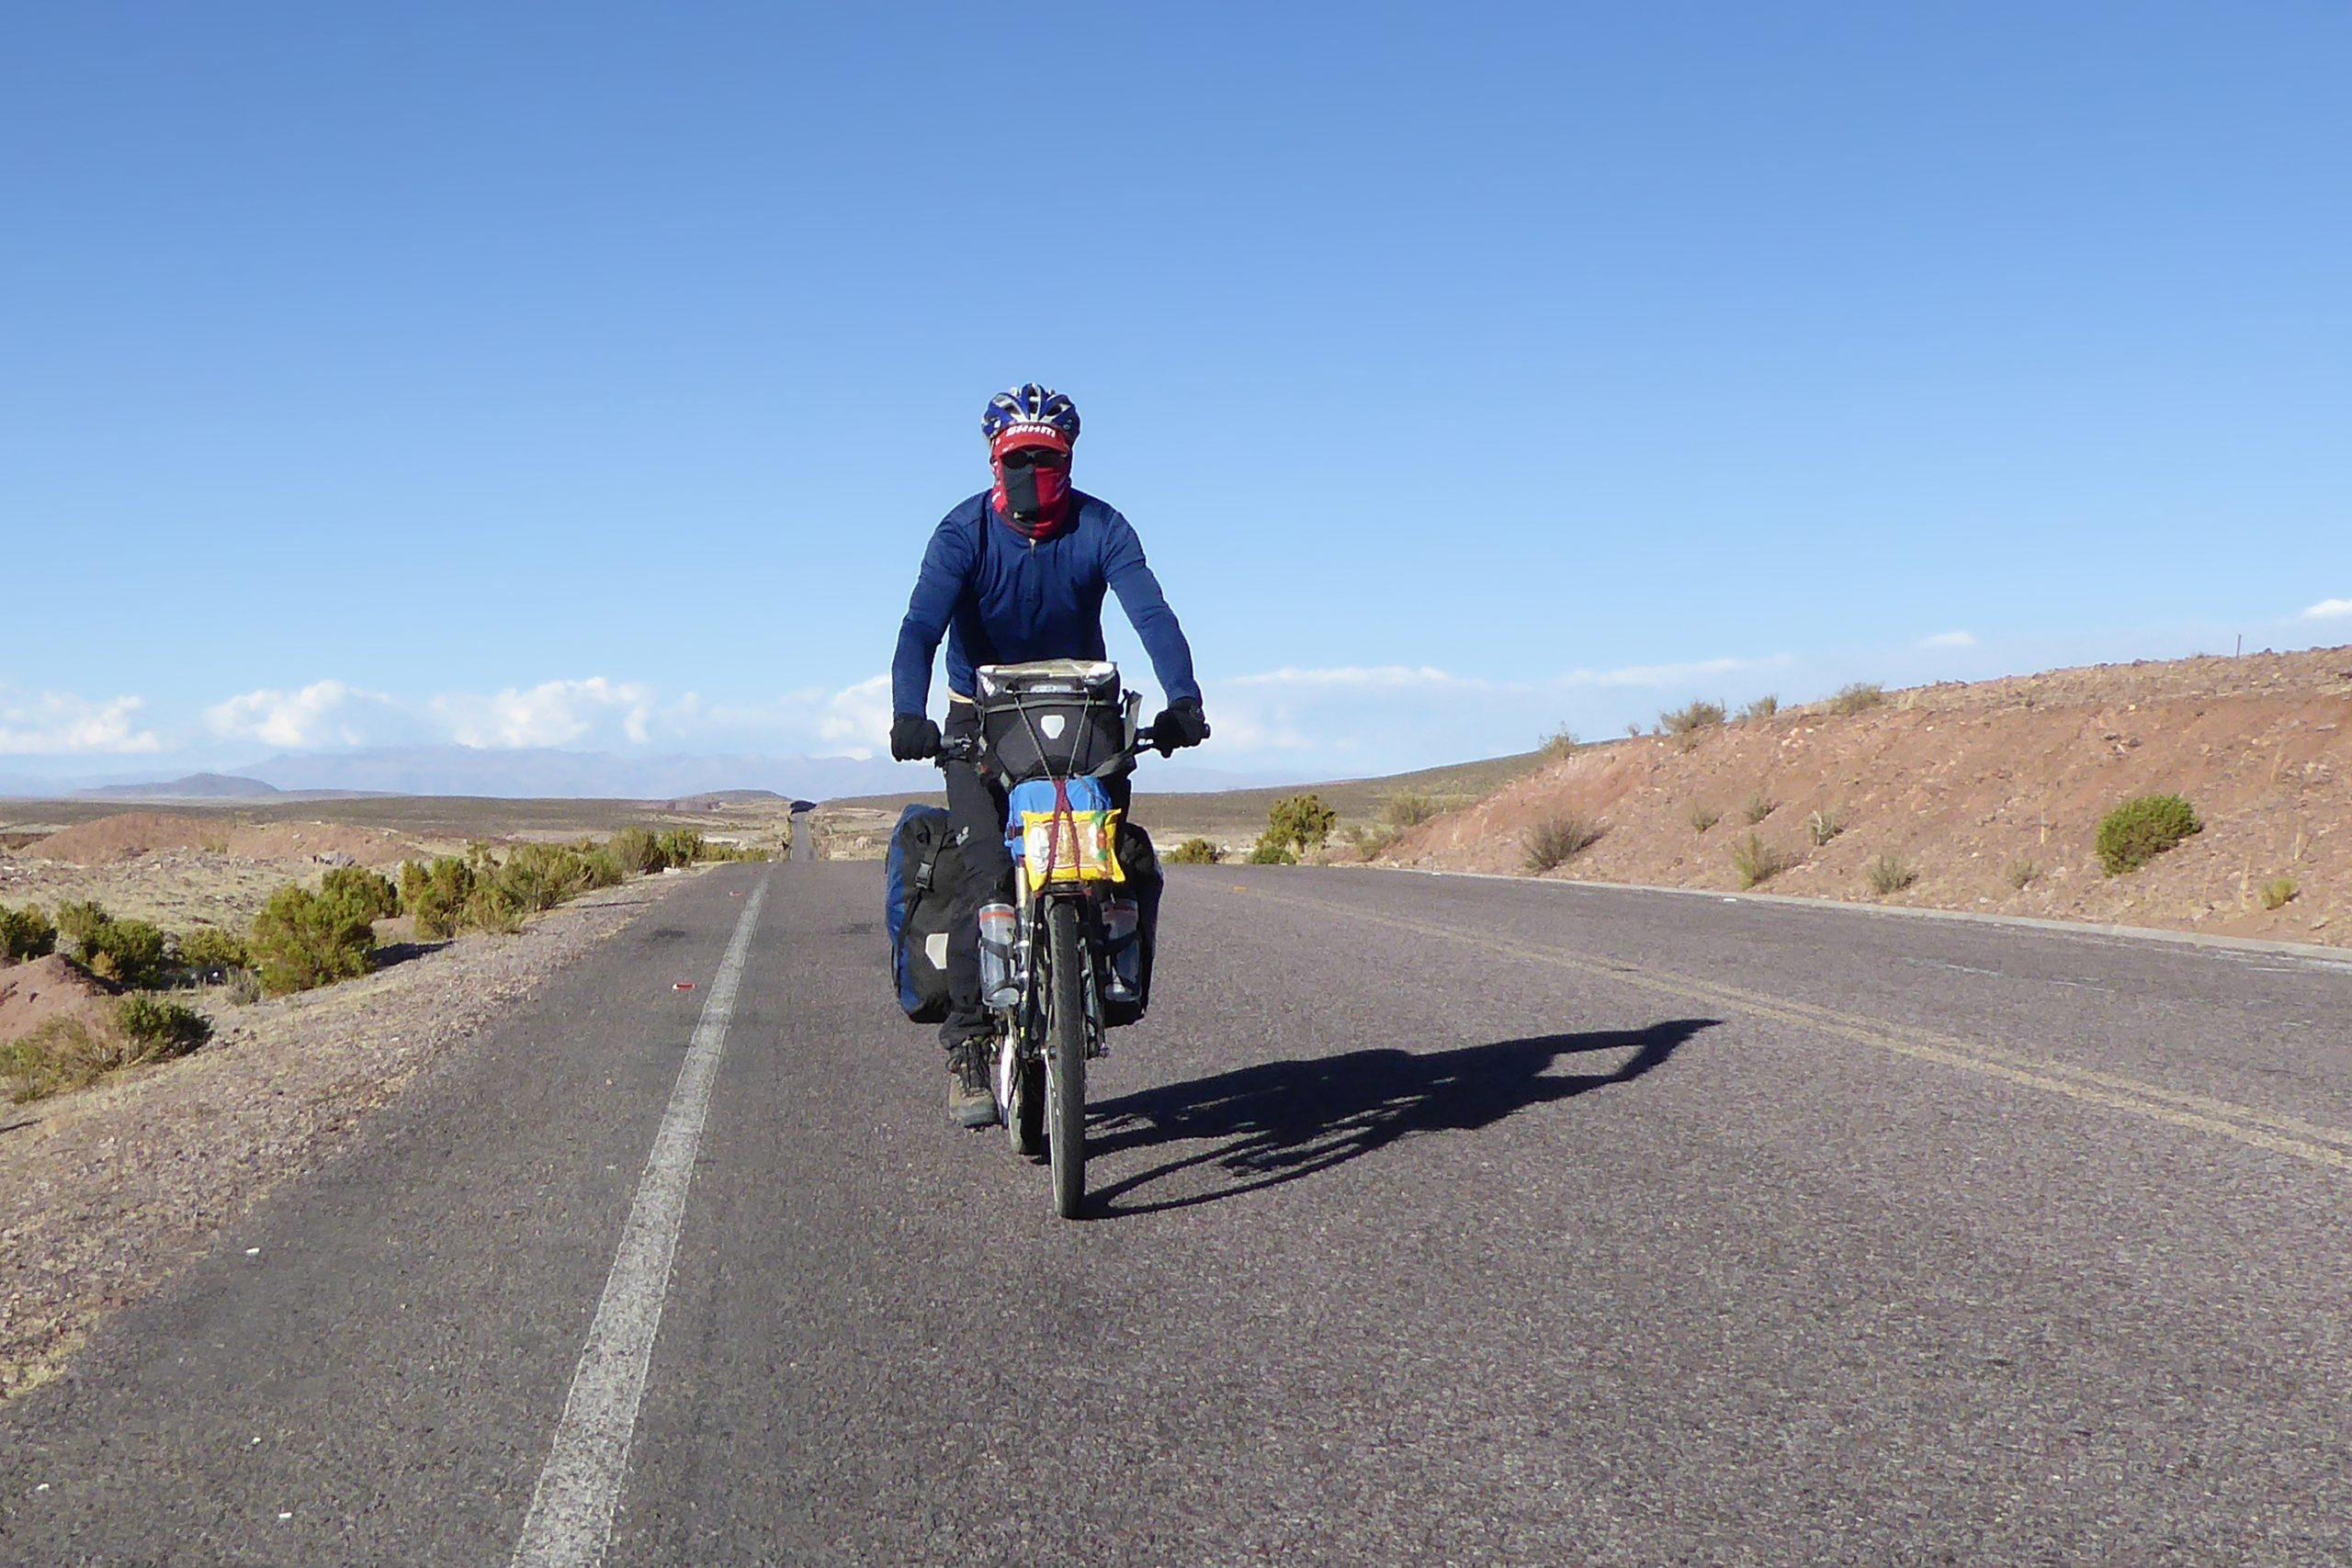 Radreise Südamerika 2019 - Altiplano - Camino 603